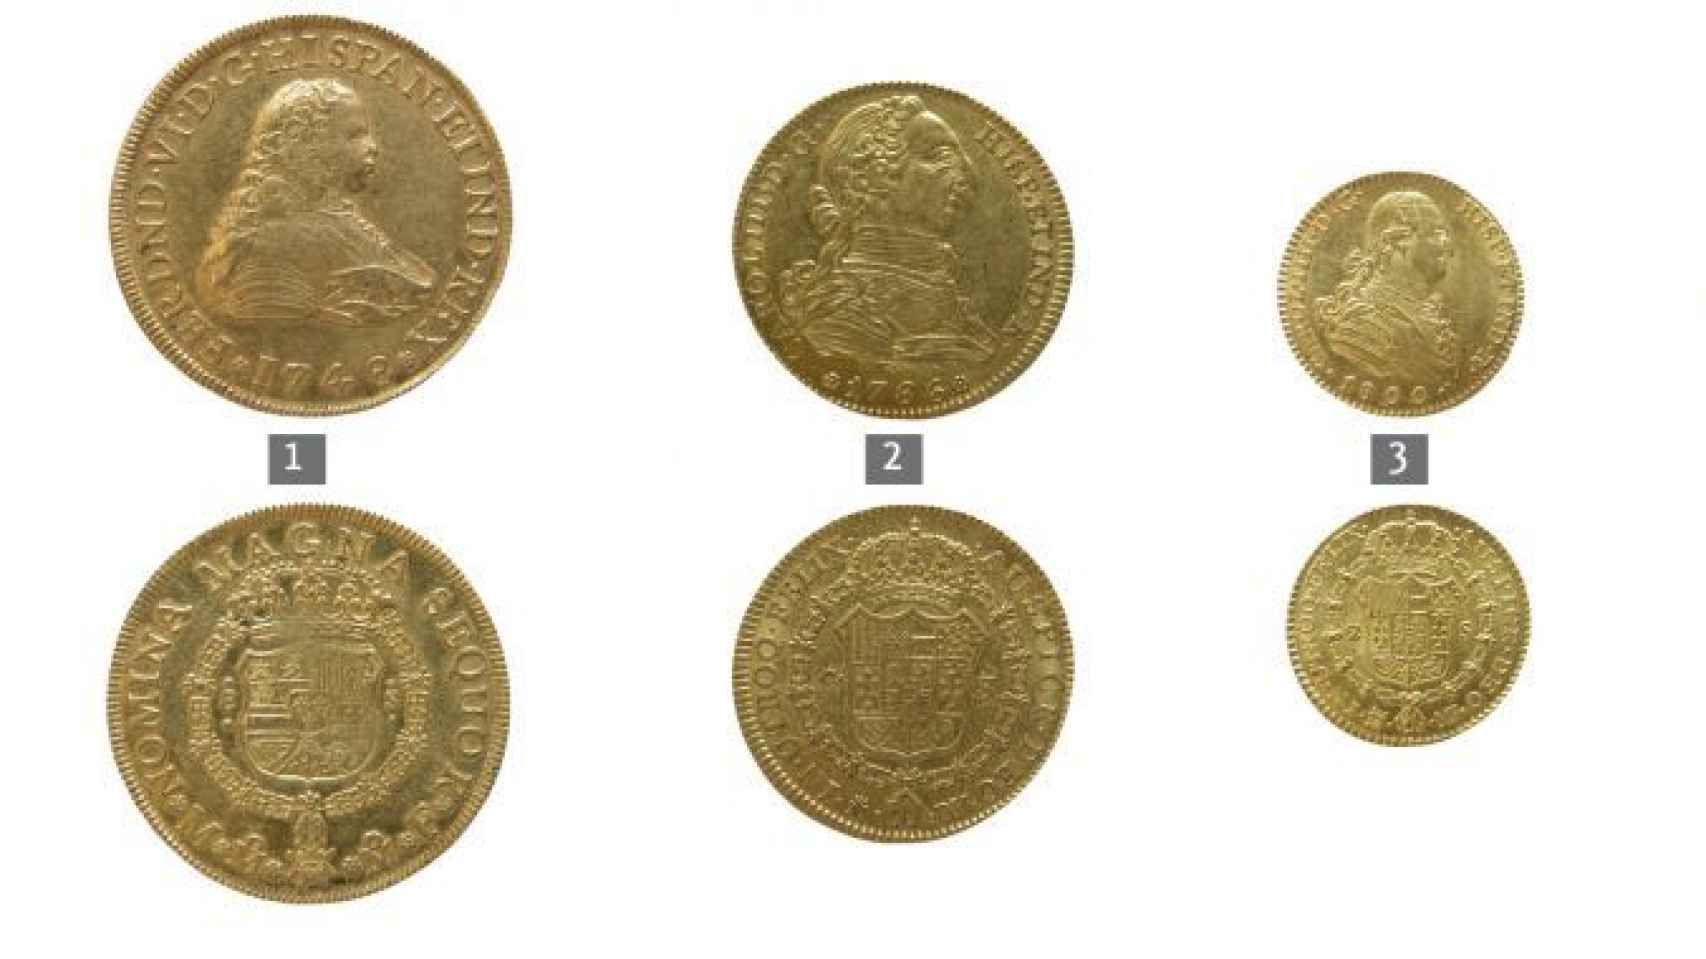 Monedas de oro del Tesoro de Sant Joan d'Alacant.